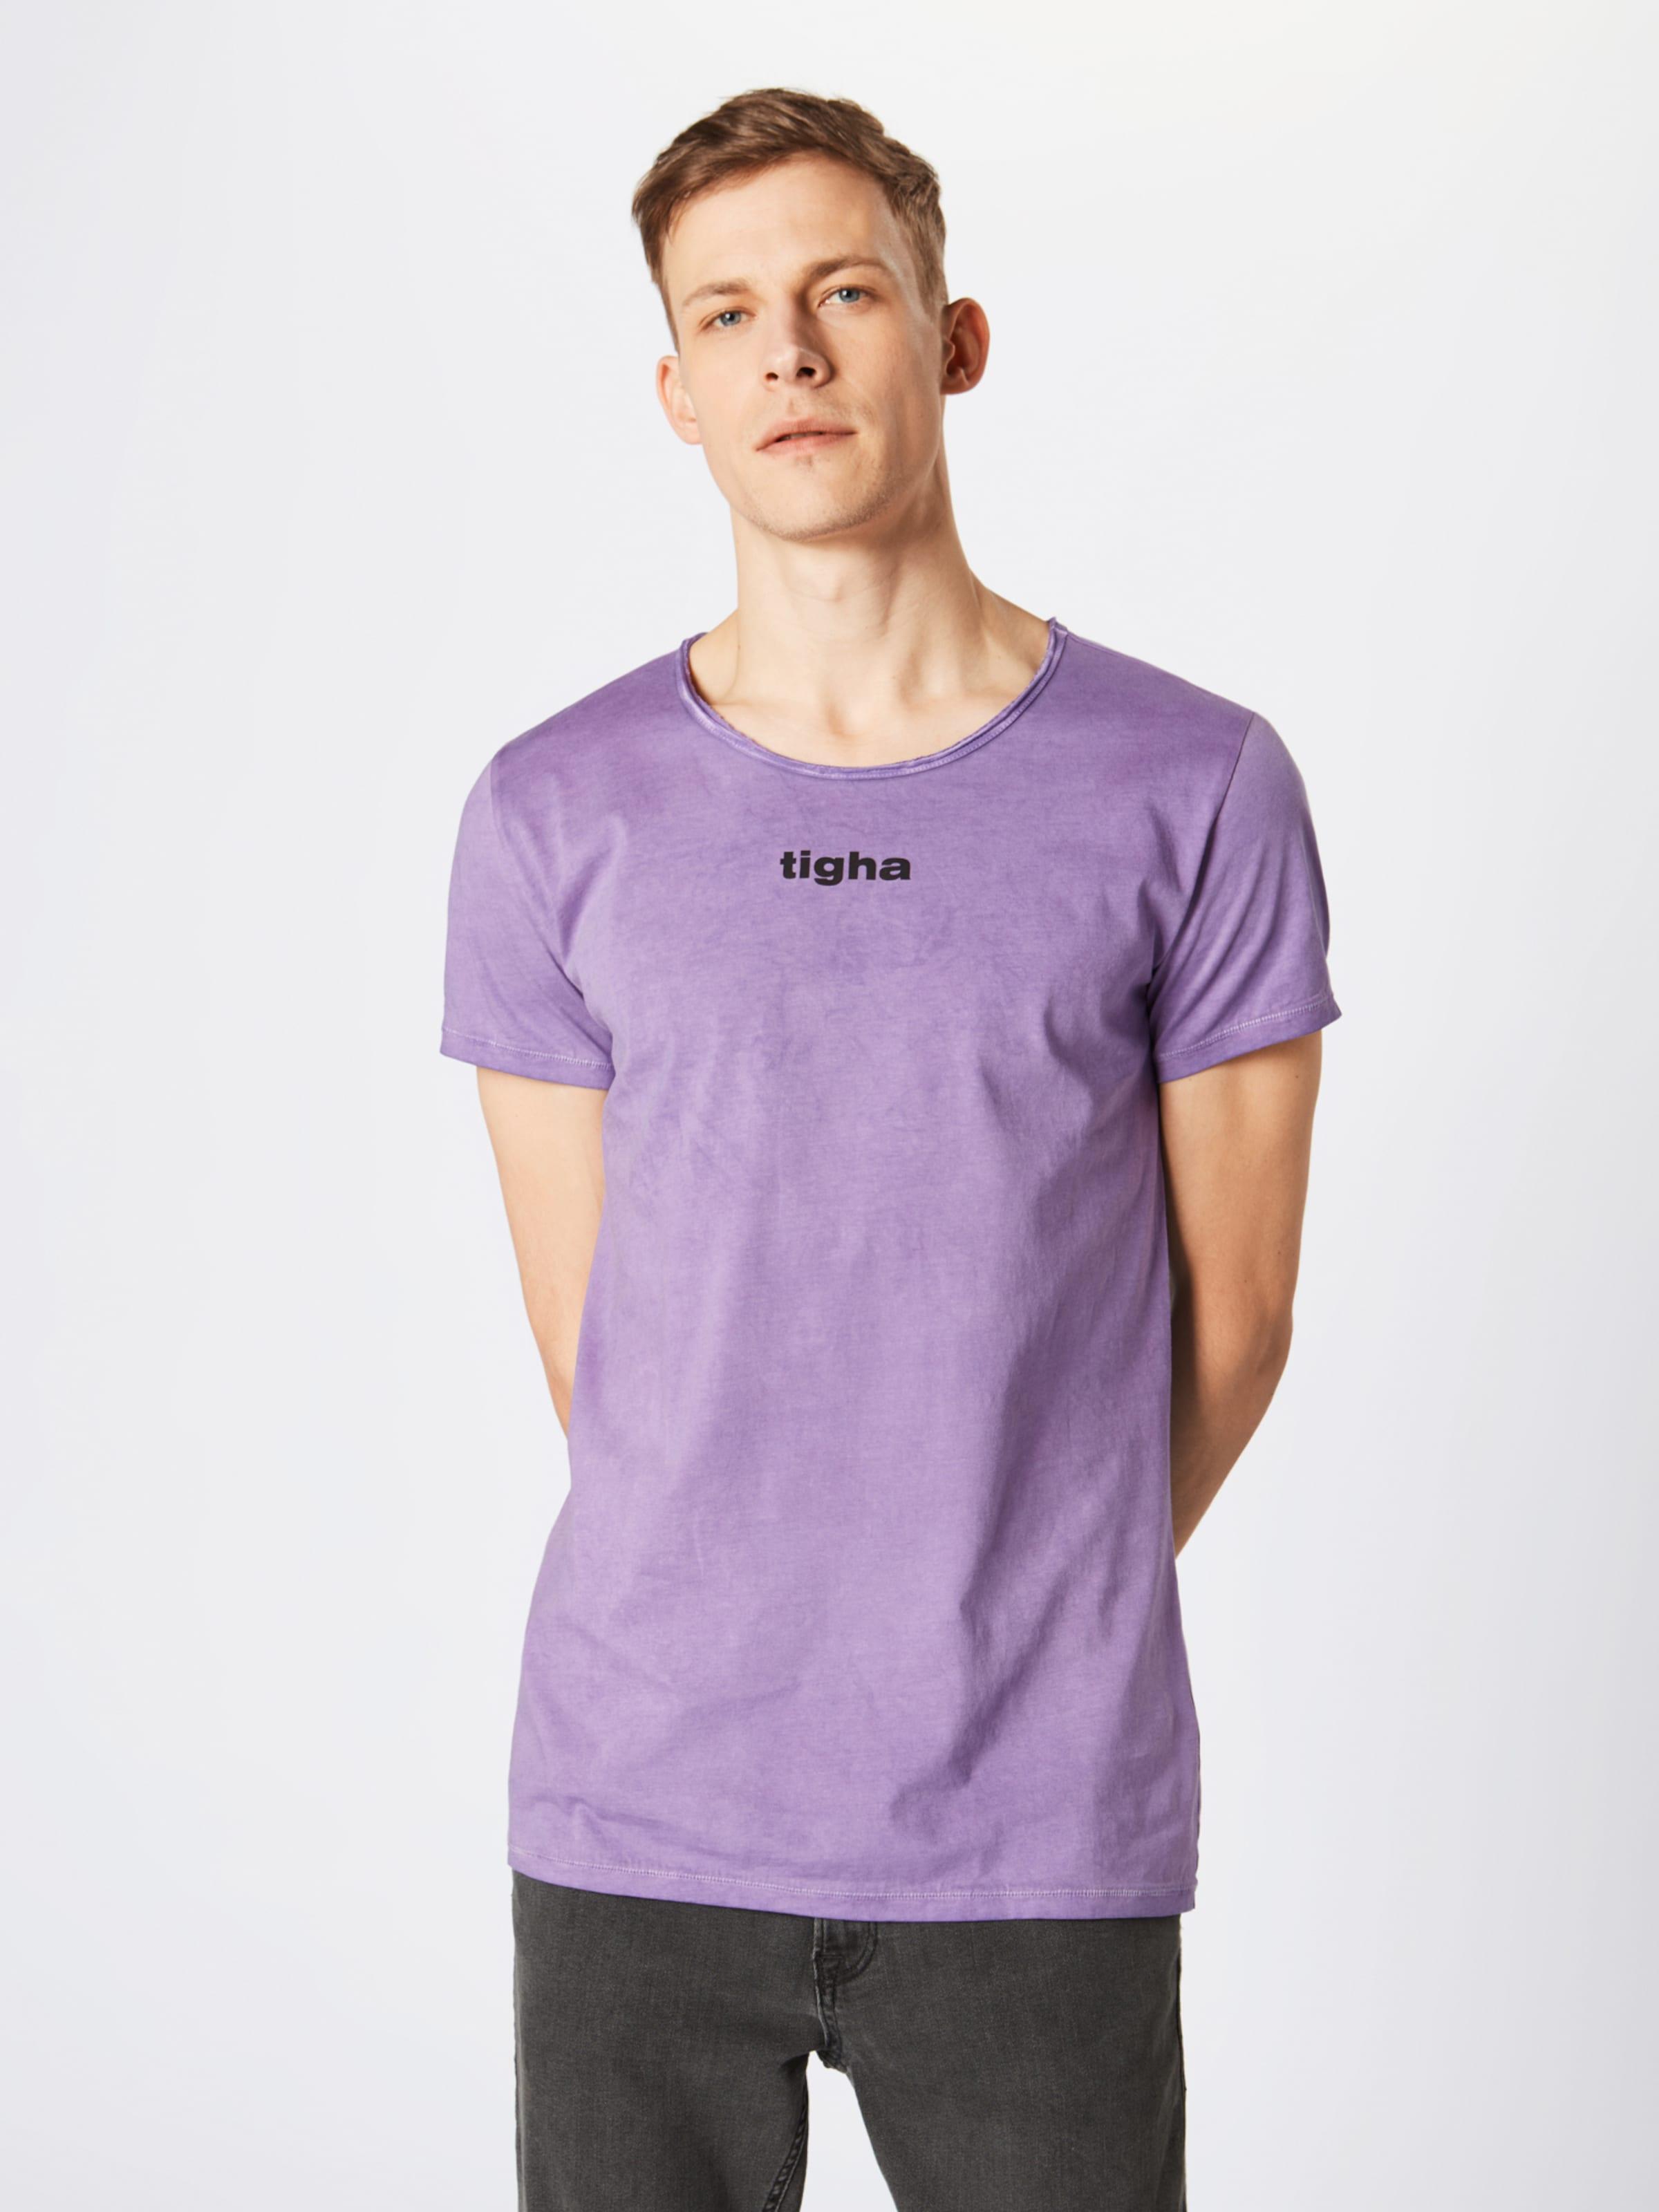 Tigha Shirt In Helllila Tigha 'jardel' 'jardel' In Tigha Shirt Helllila GUMqzLSVp